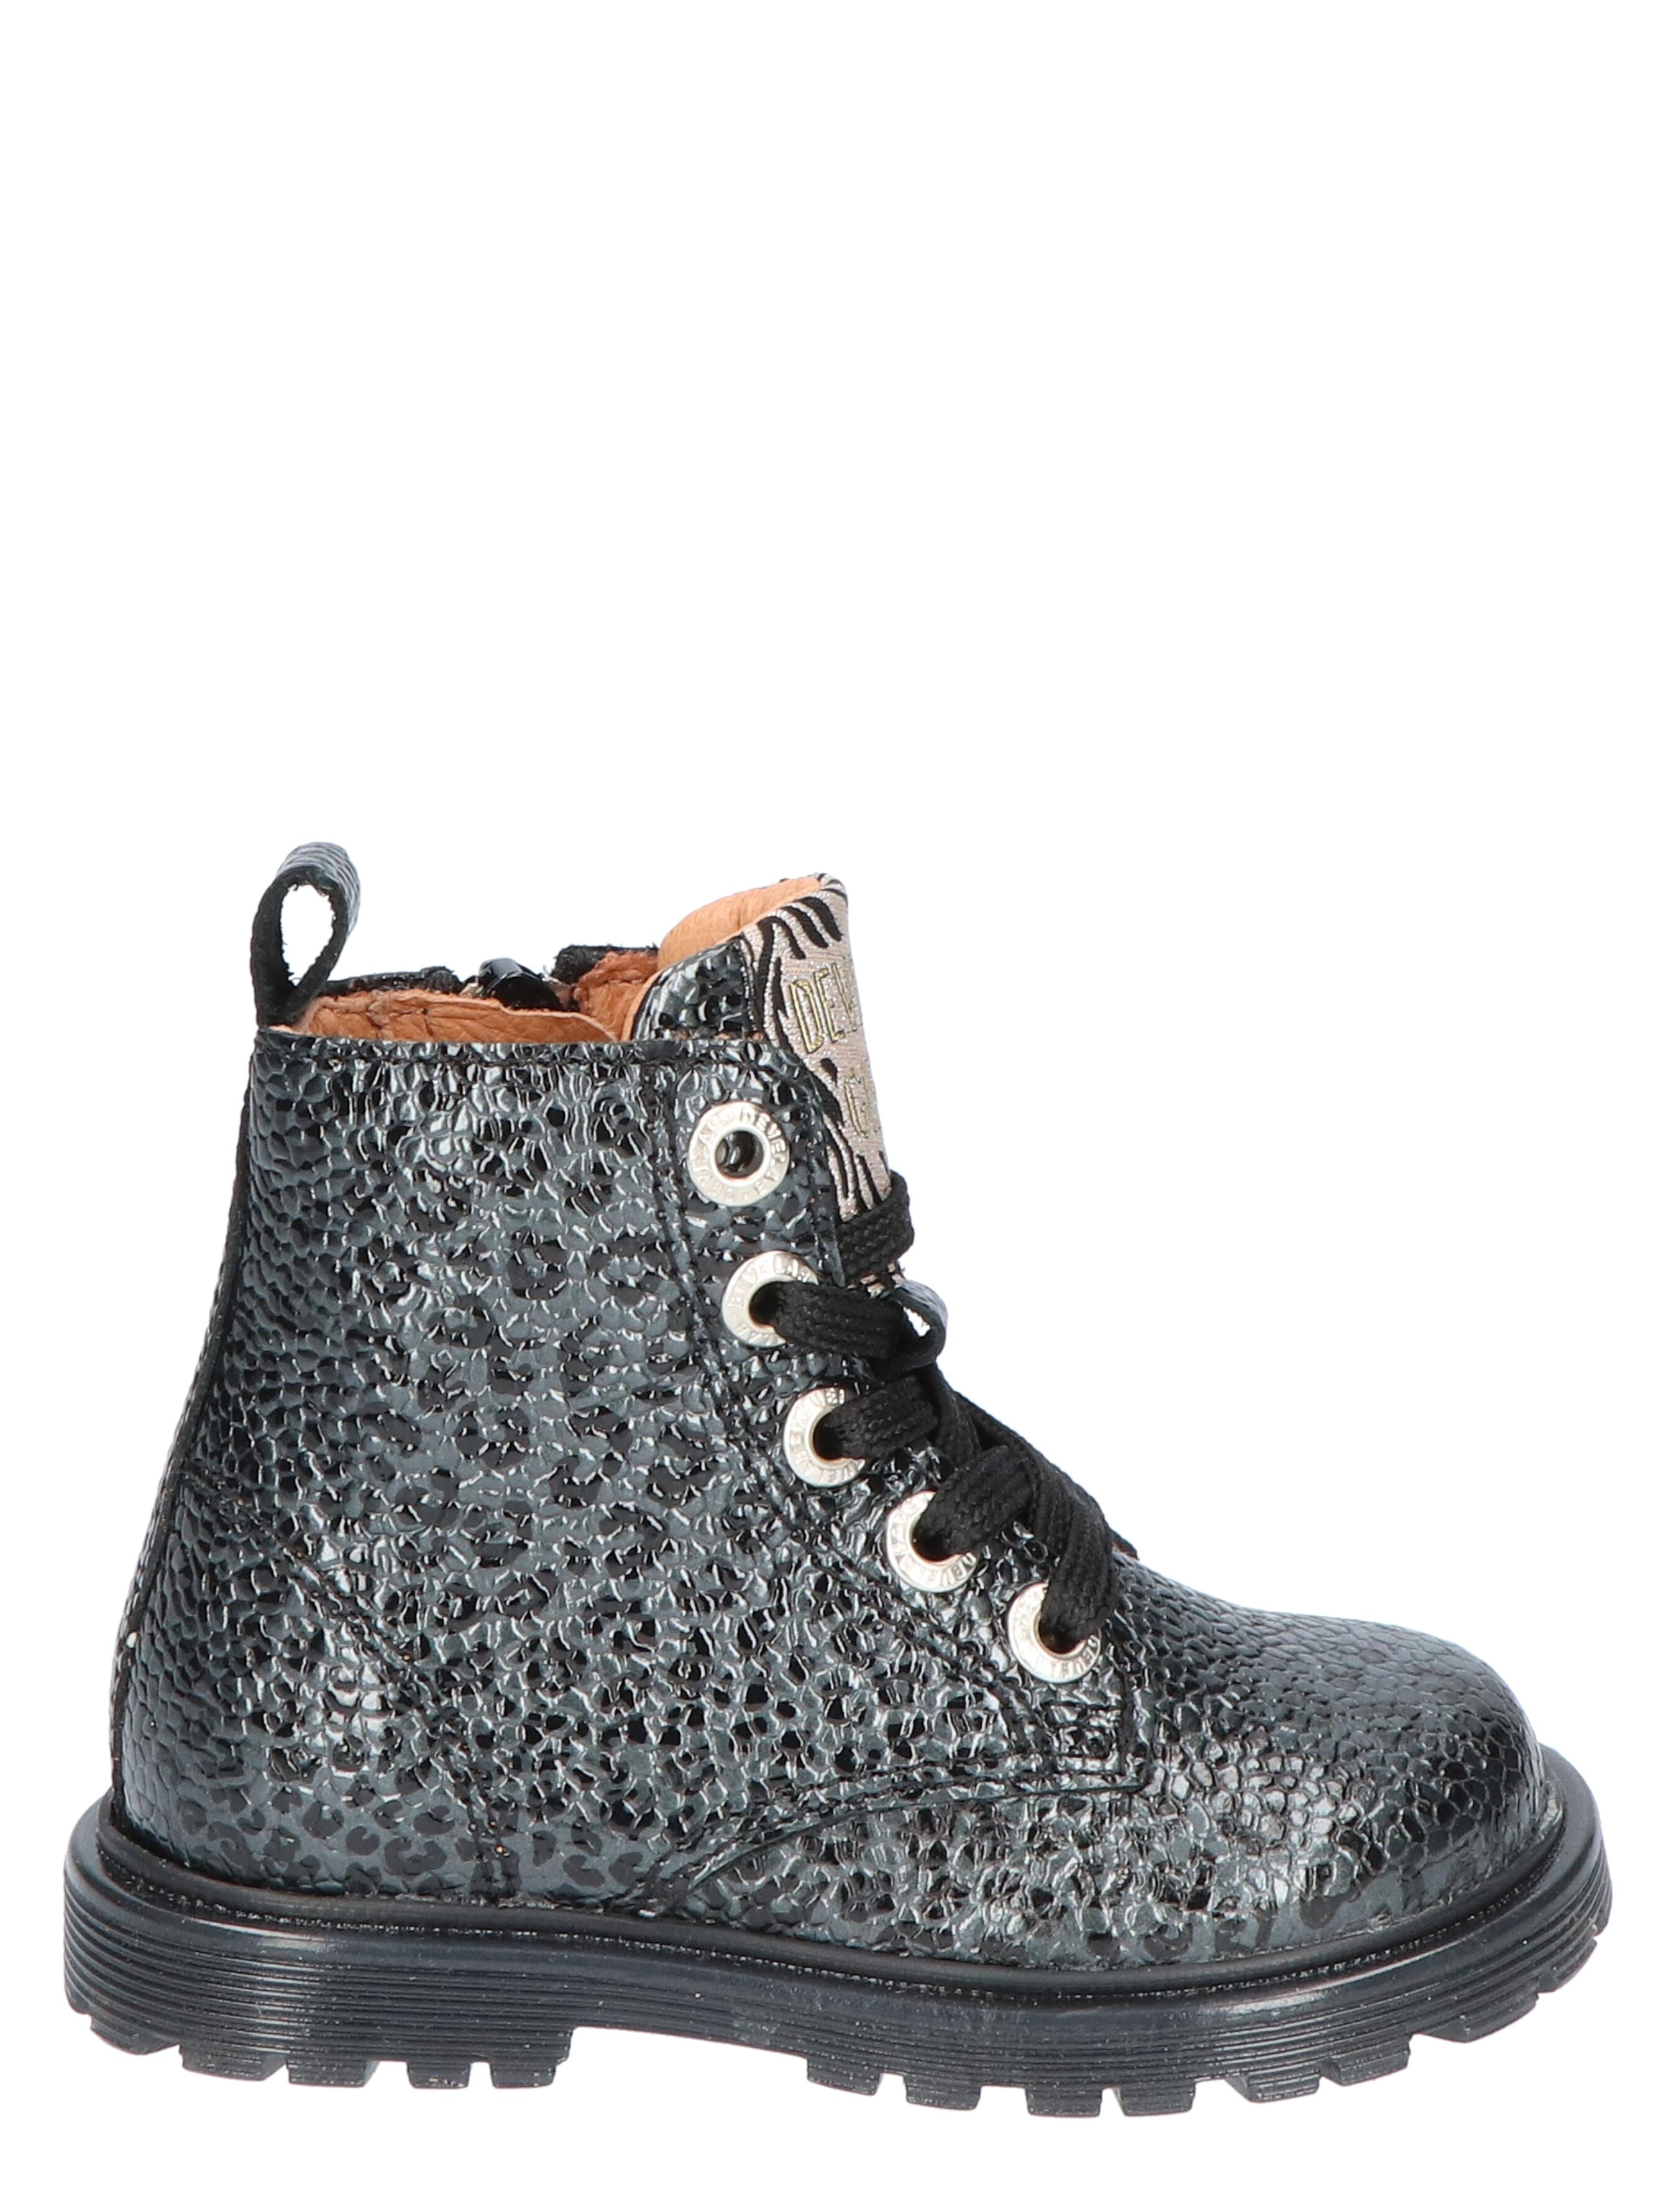 Develab 42102 839 Anthracite Fantasy Veter boots